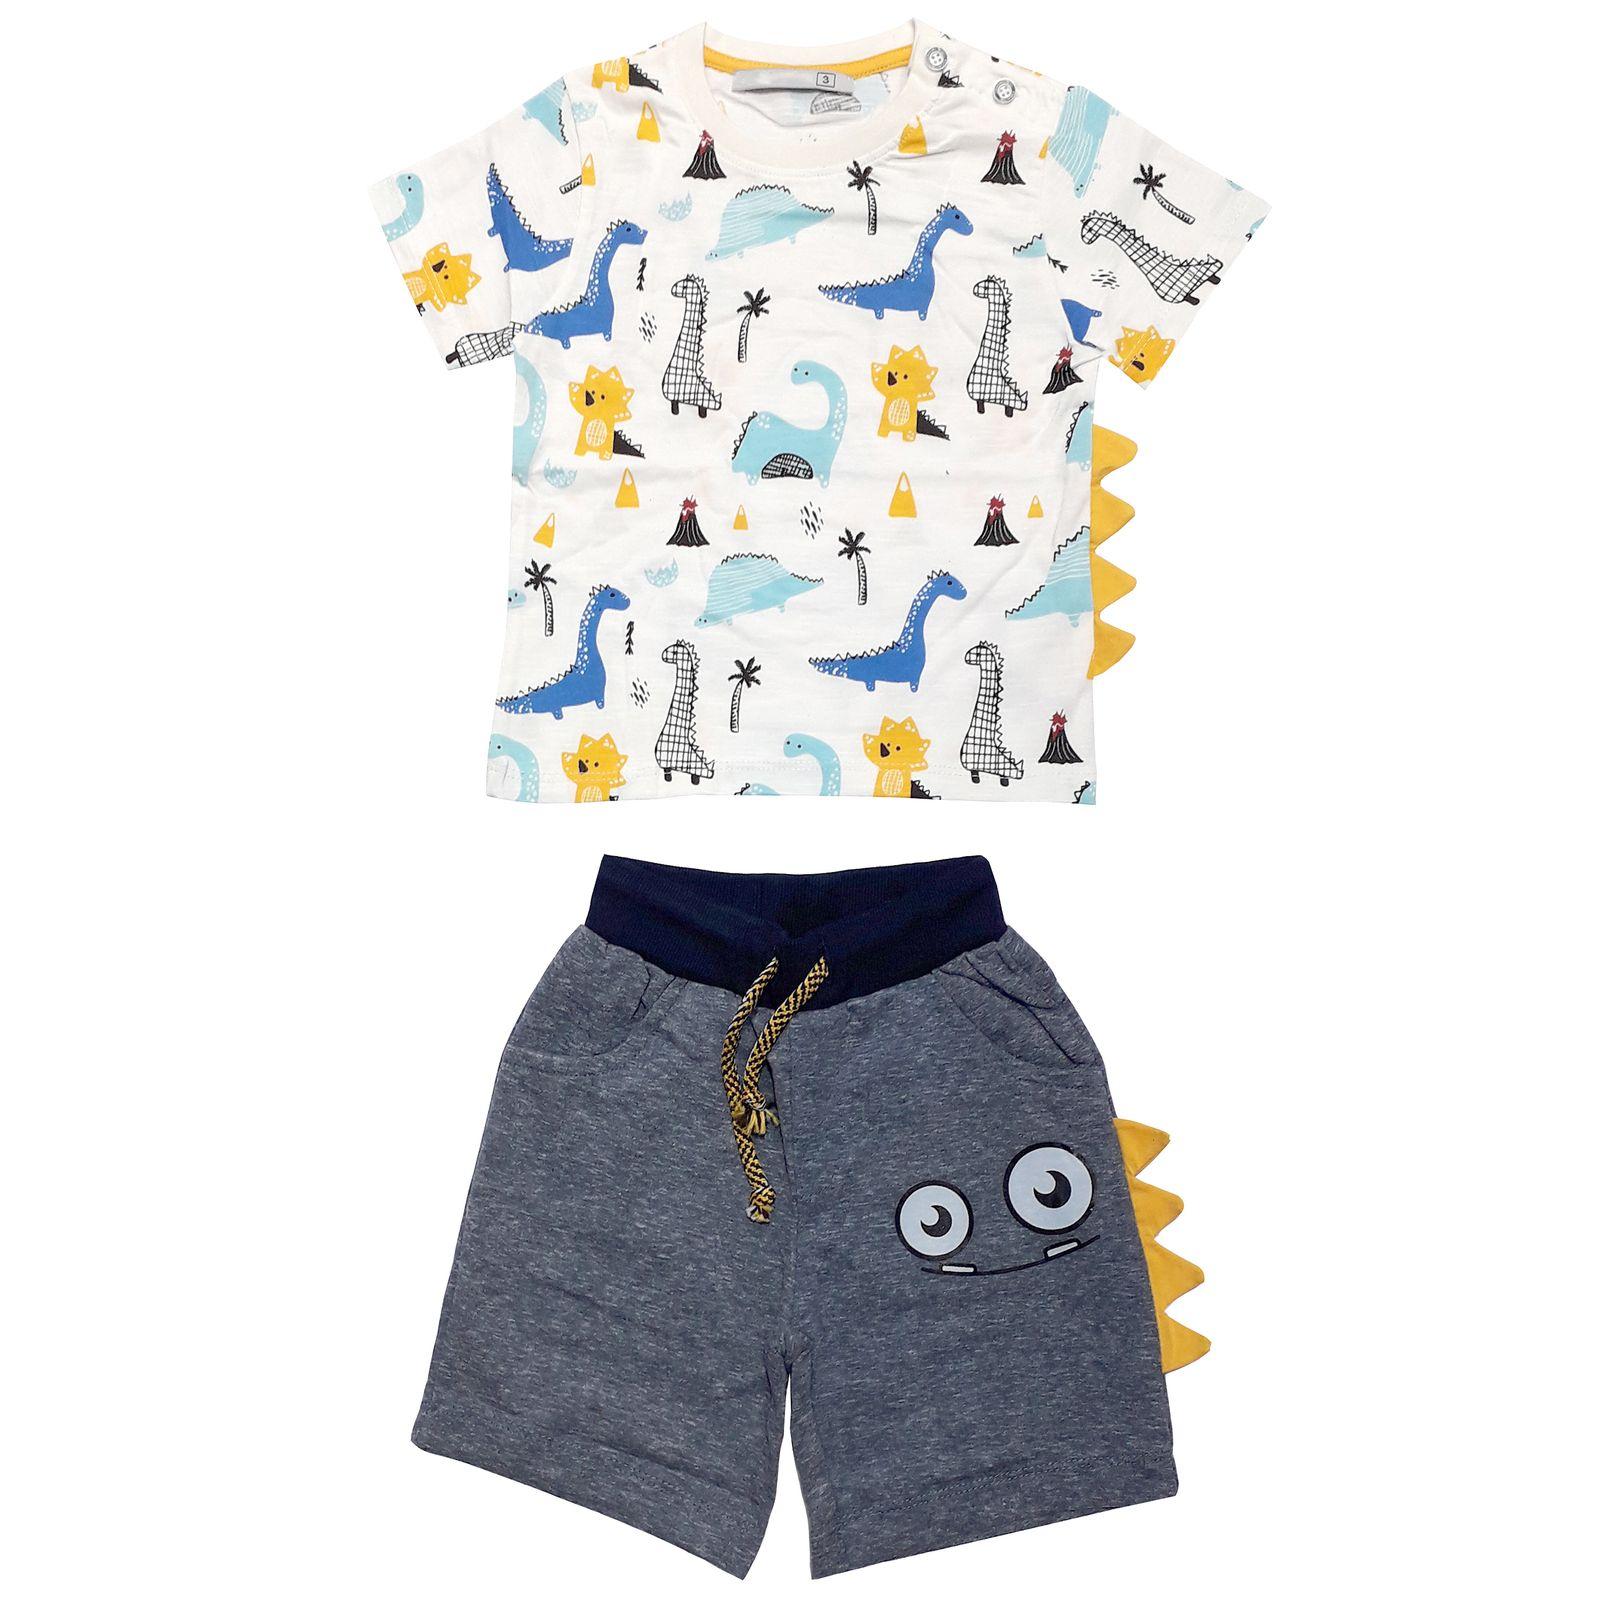 ست تی شرت و شلوارک پسرانه طرح دایناسور کد 2041 -  - 1